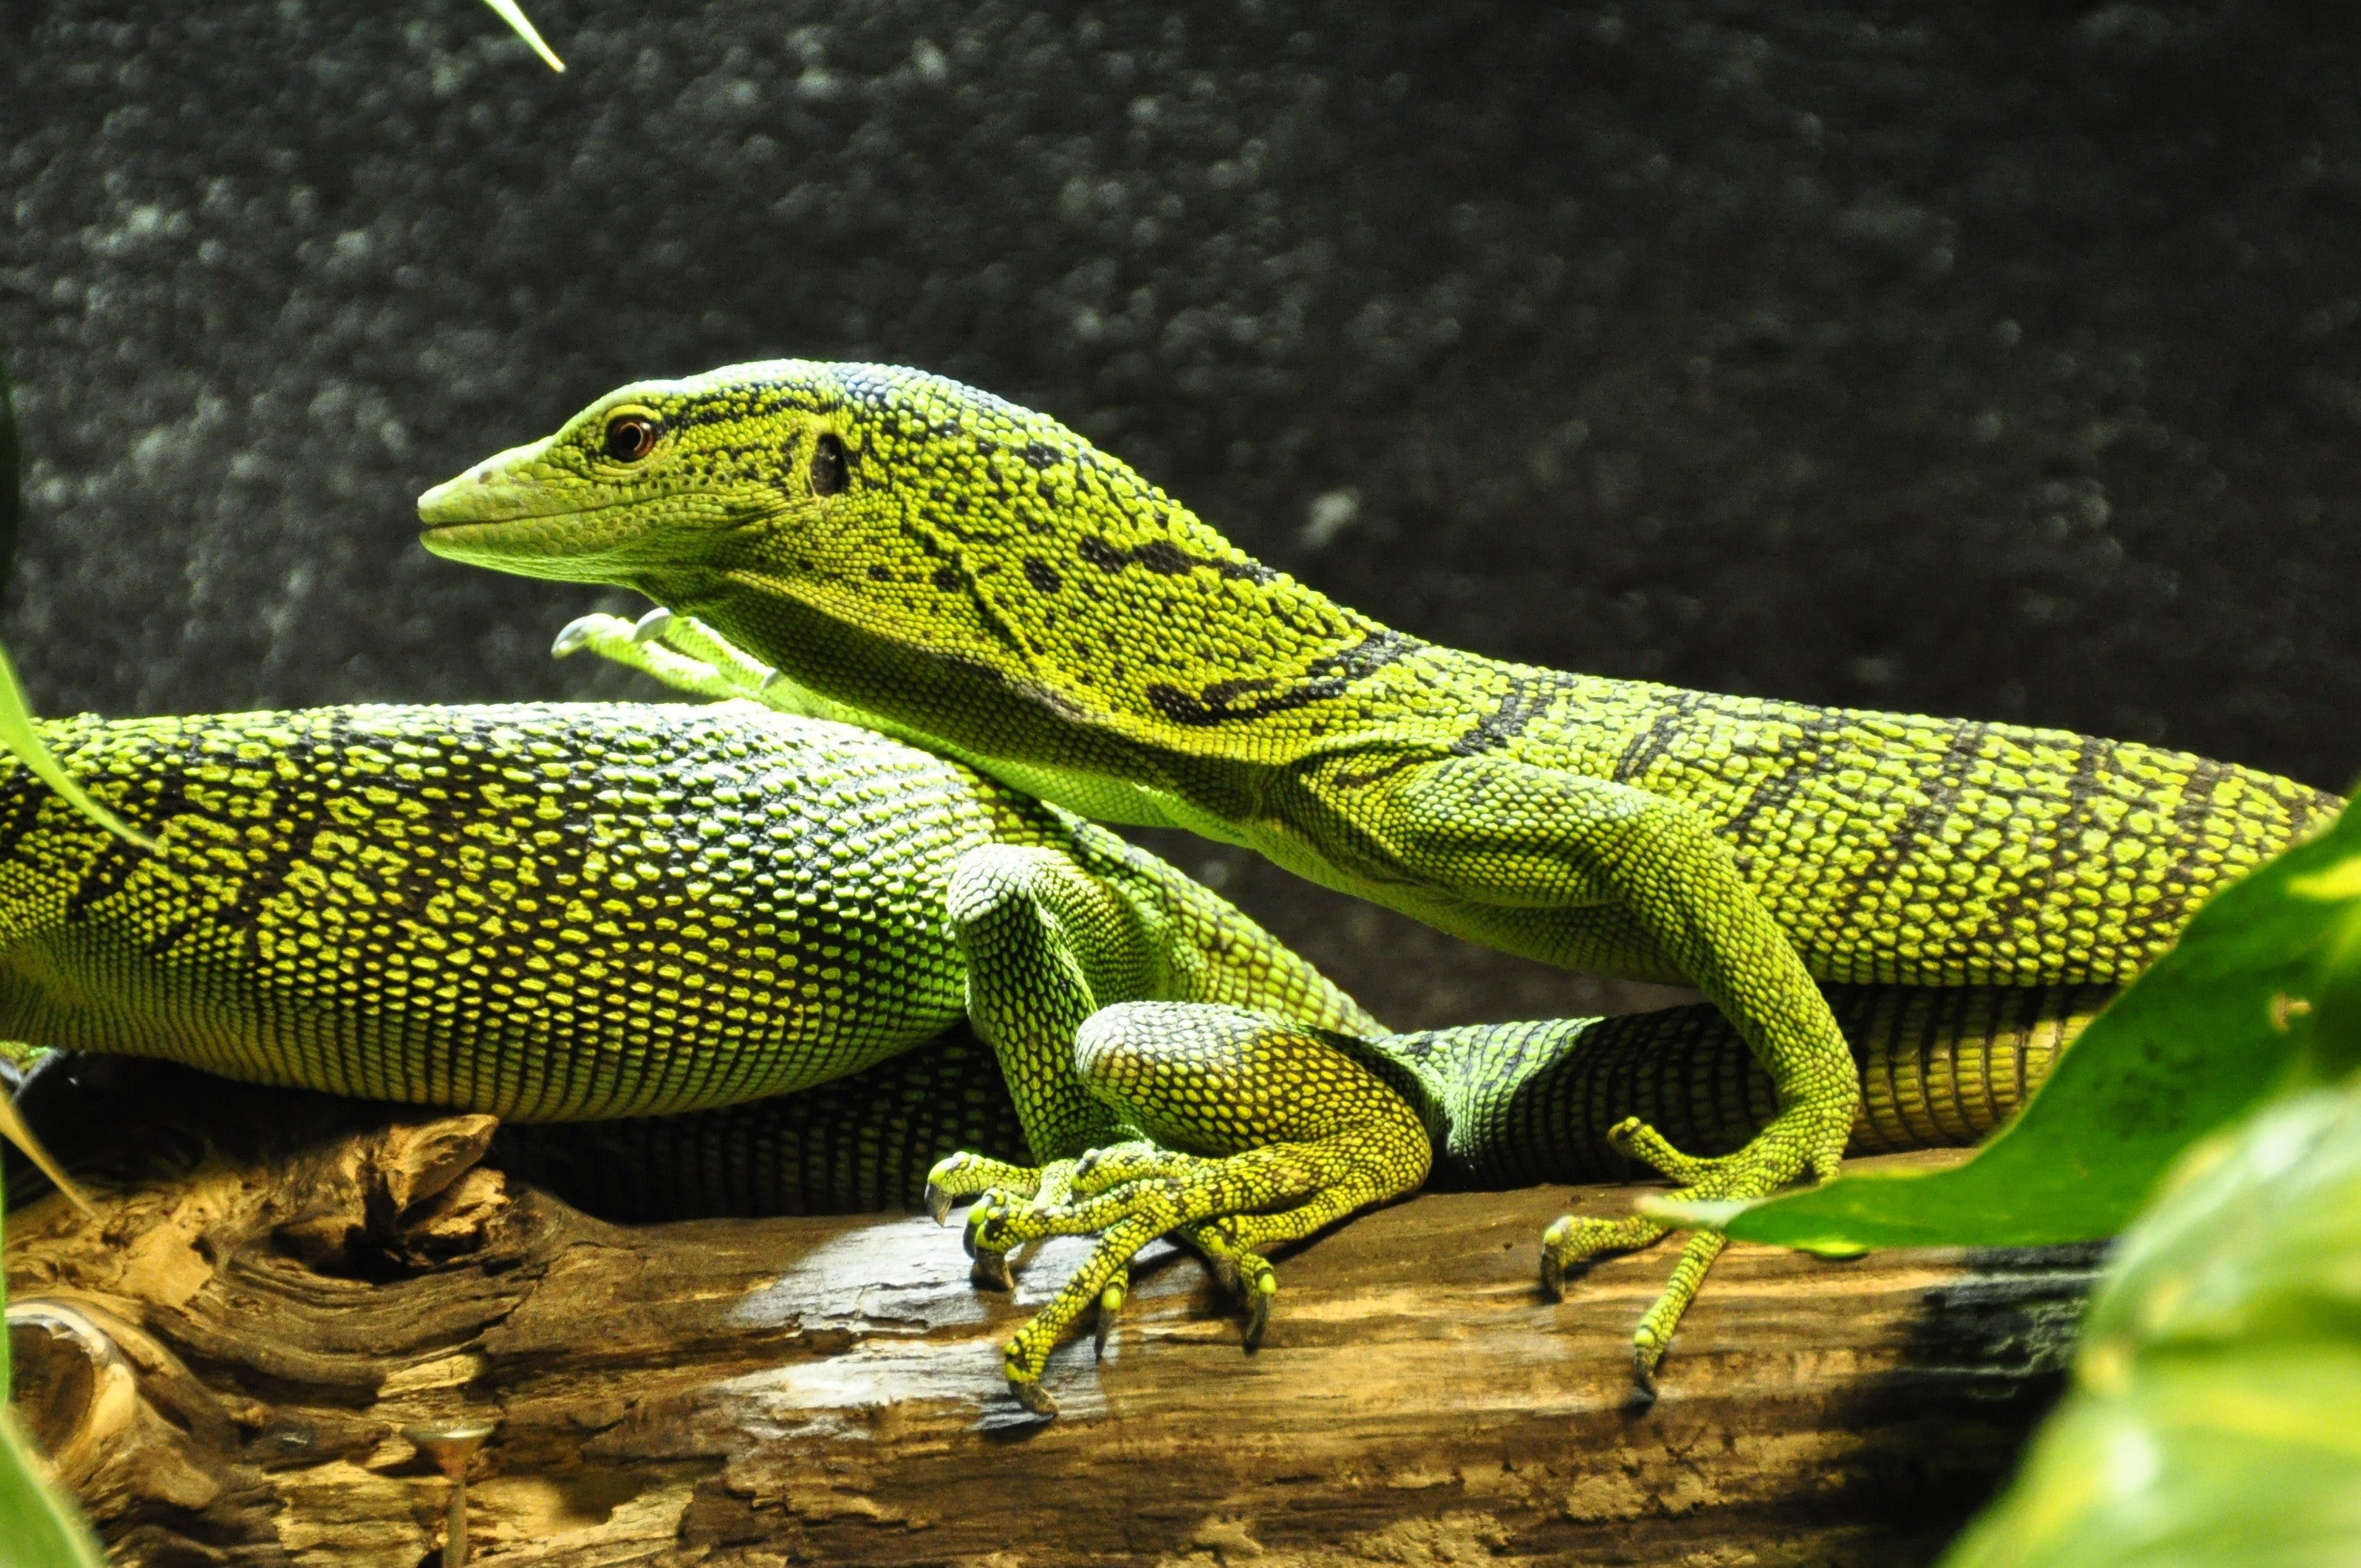 Green Crested Lizard, Macro, Reptile, Lizards, Green, HQ Photo